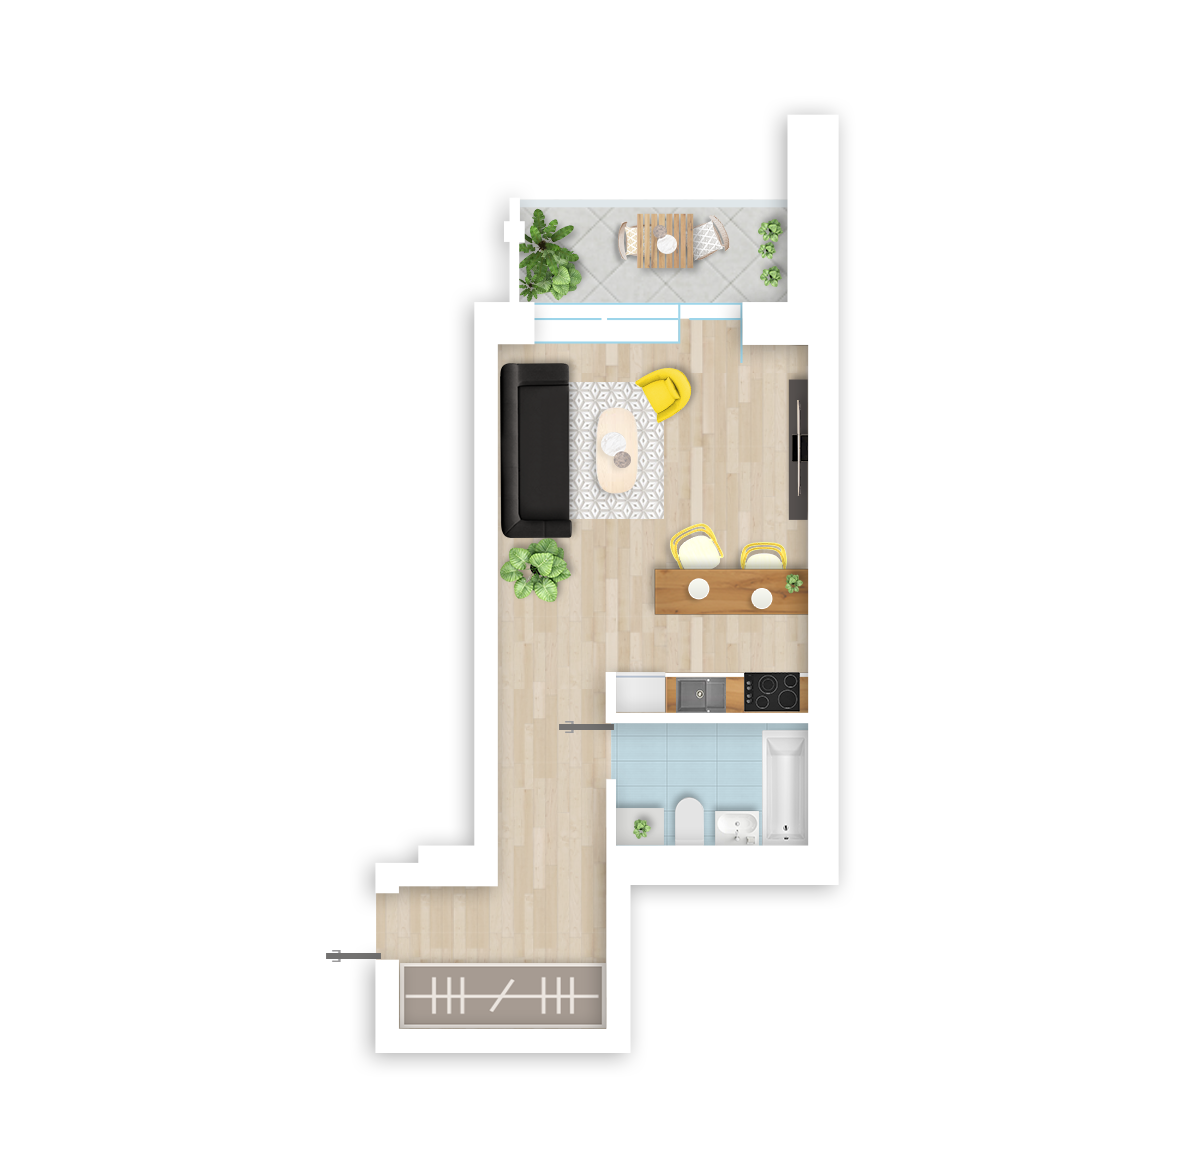 parduodamas butas Lietaus g. 4 - 11 Vilniuje, buto 3D vaizdas